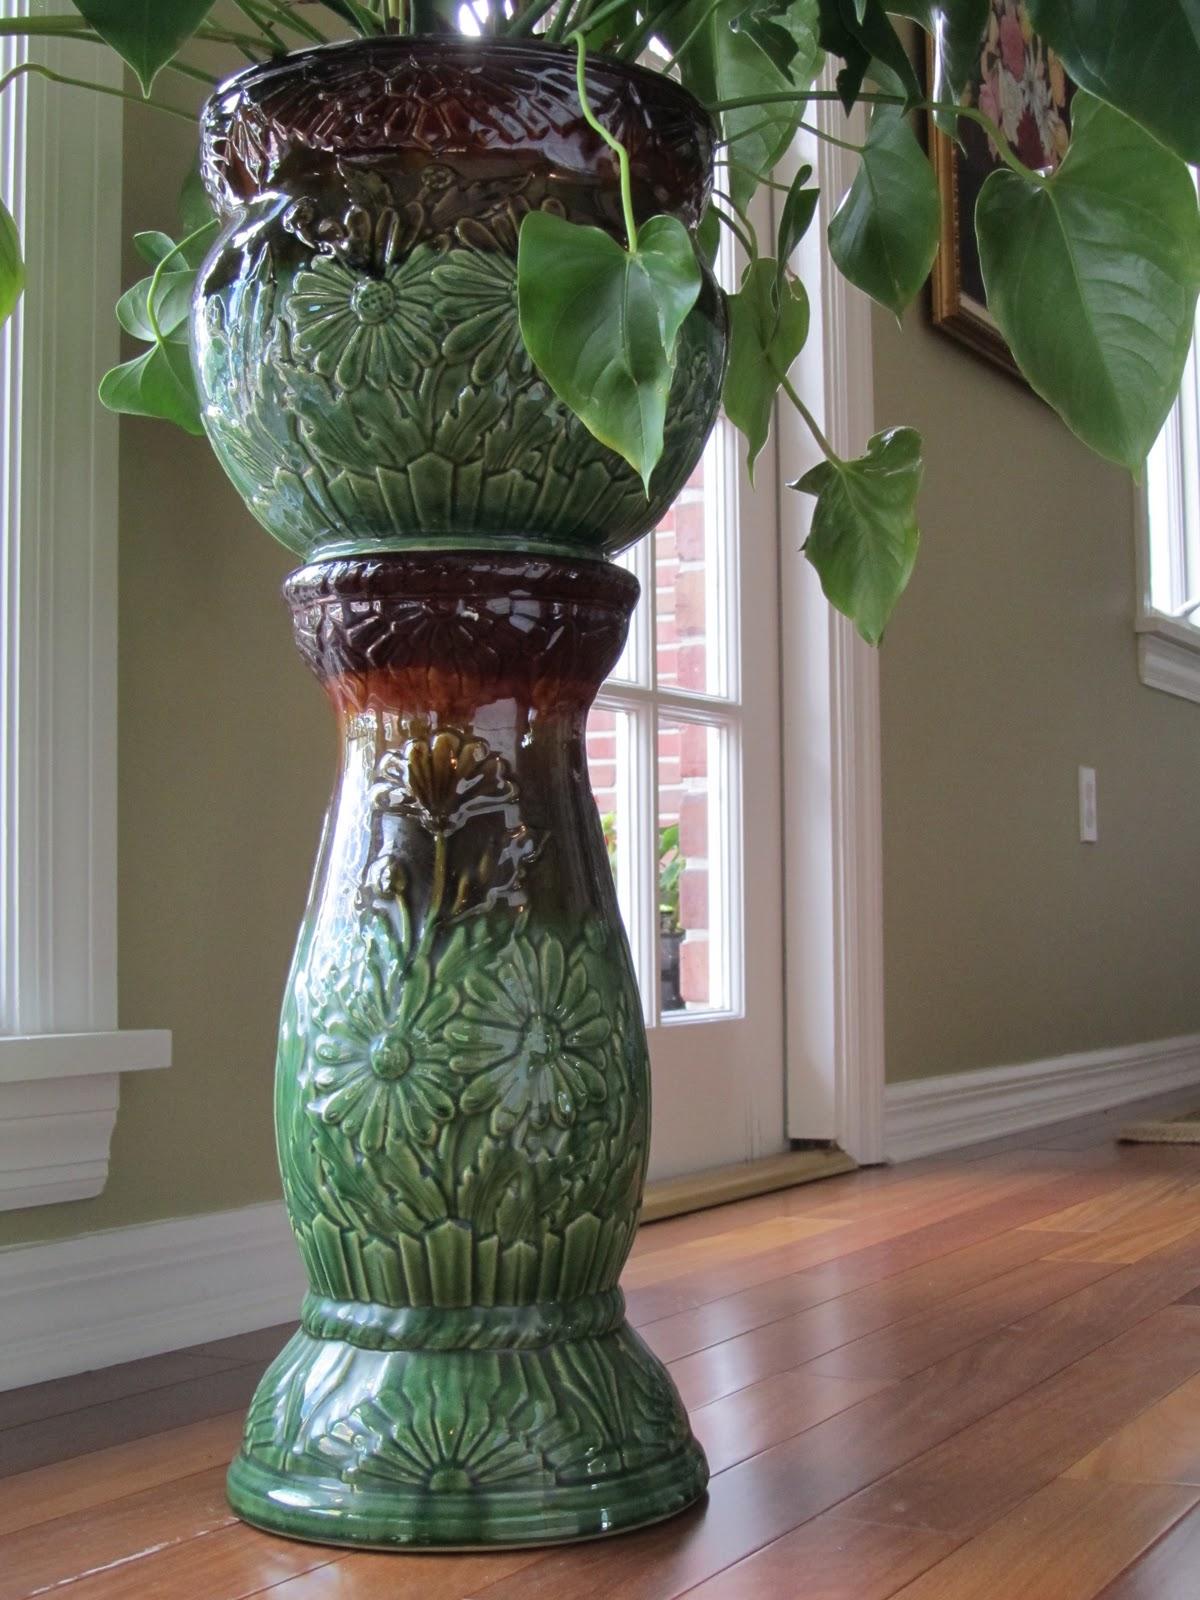 jardiniere design trendy jardinire en bton with jardiniere design elegant jardiniere design. Black Bedroom Furniture Sets. Home Design Ideas